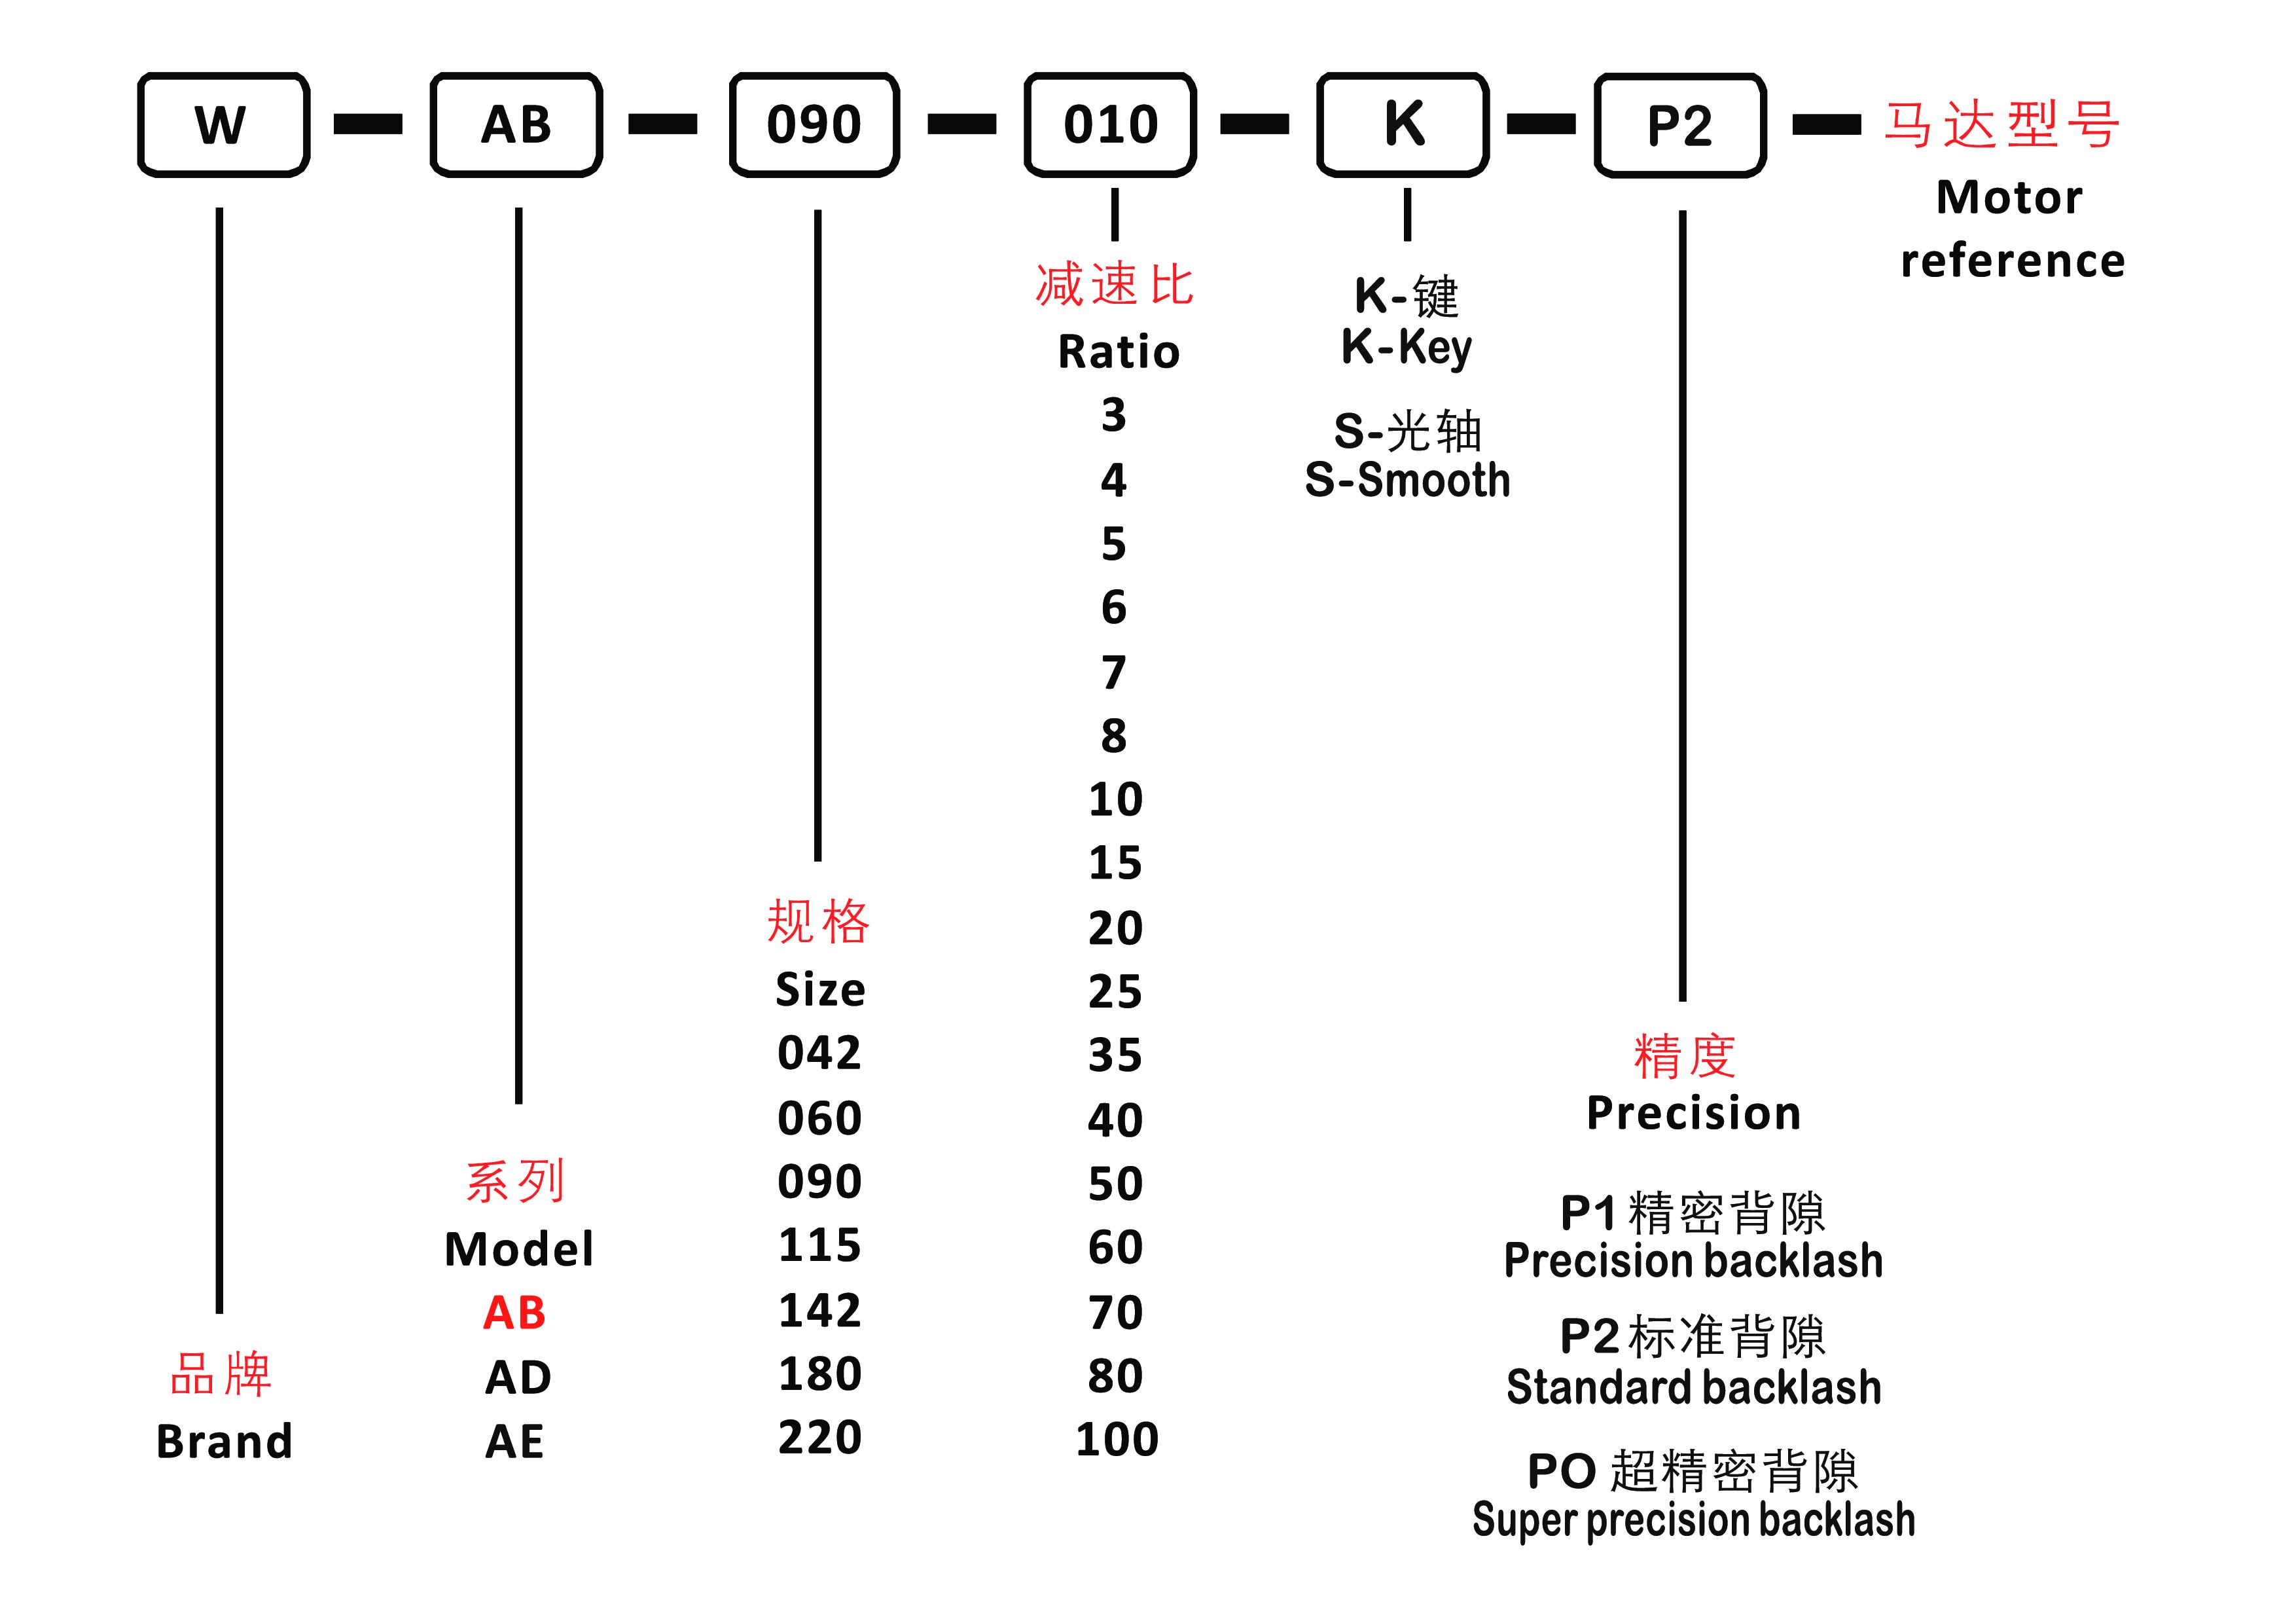 система обозначений AB.